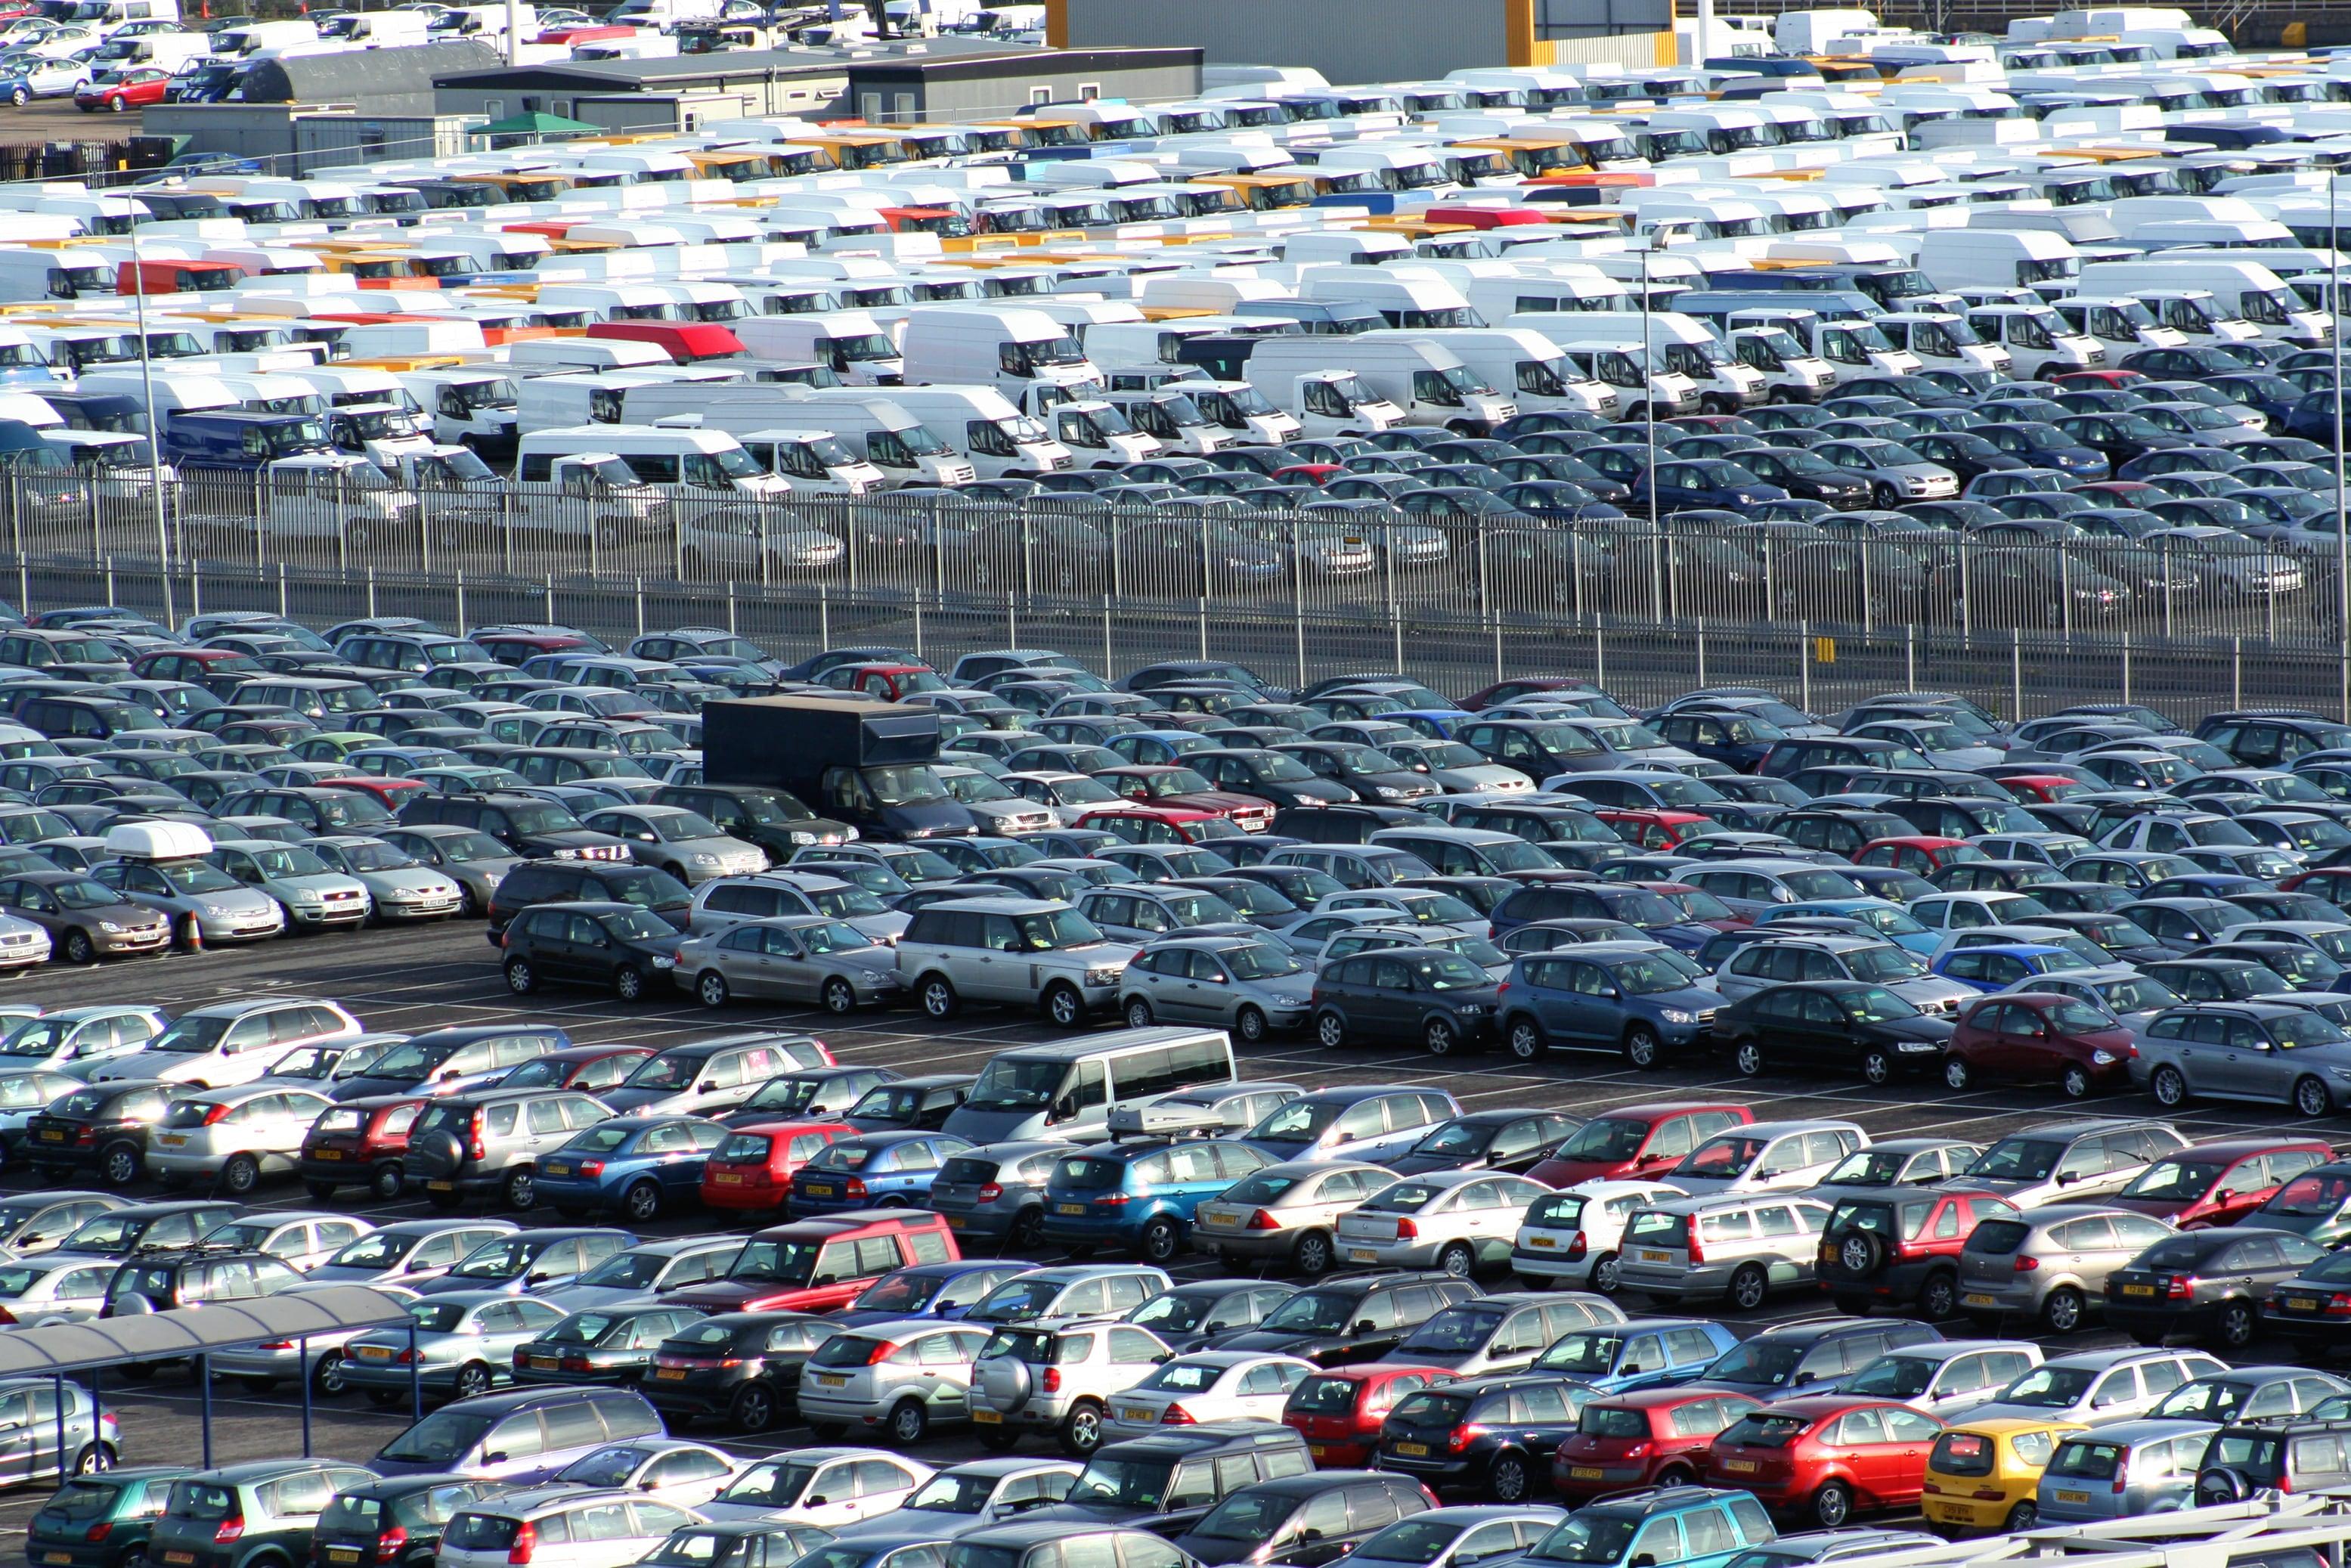 serving fiat dealer denver dealership near of exterior htm north autonation leasing view